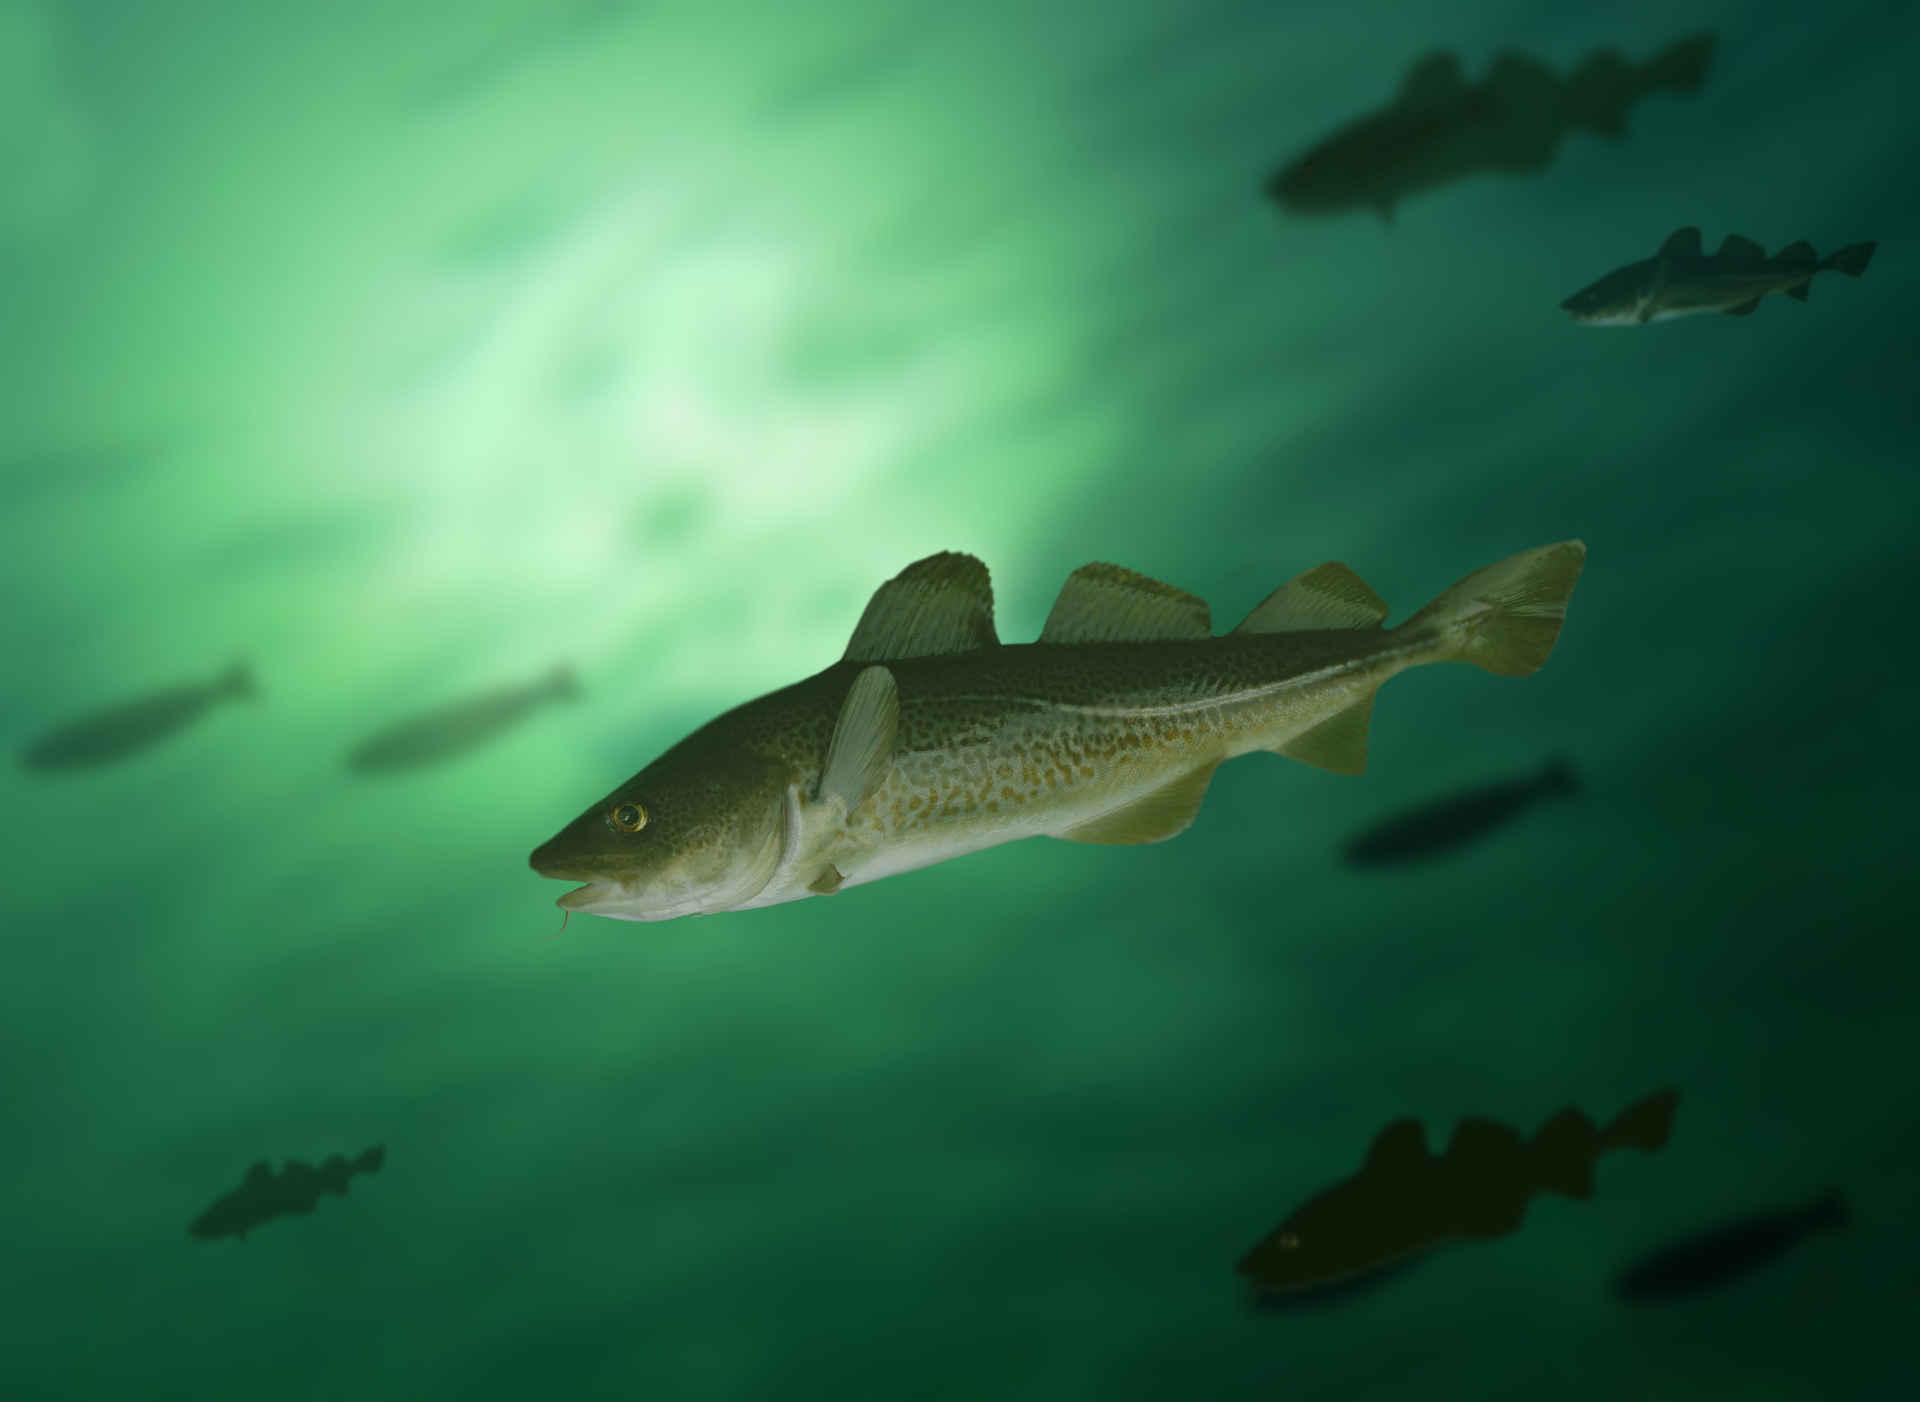 Fisch essen an der Ostsee? Bitte nicht Dorsch